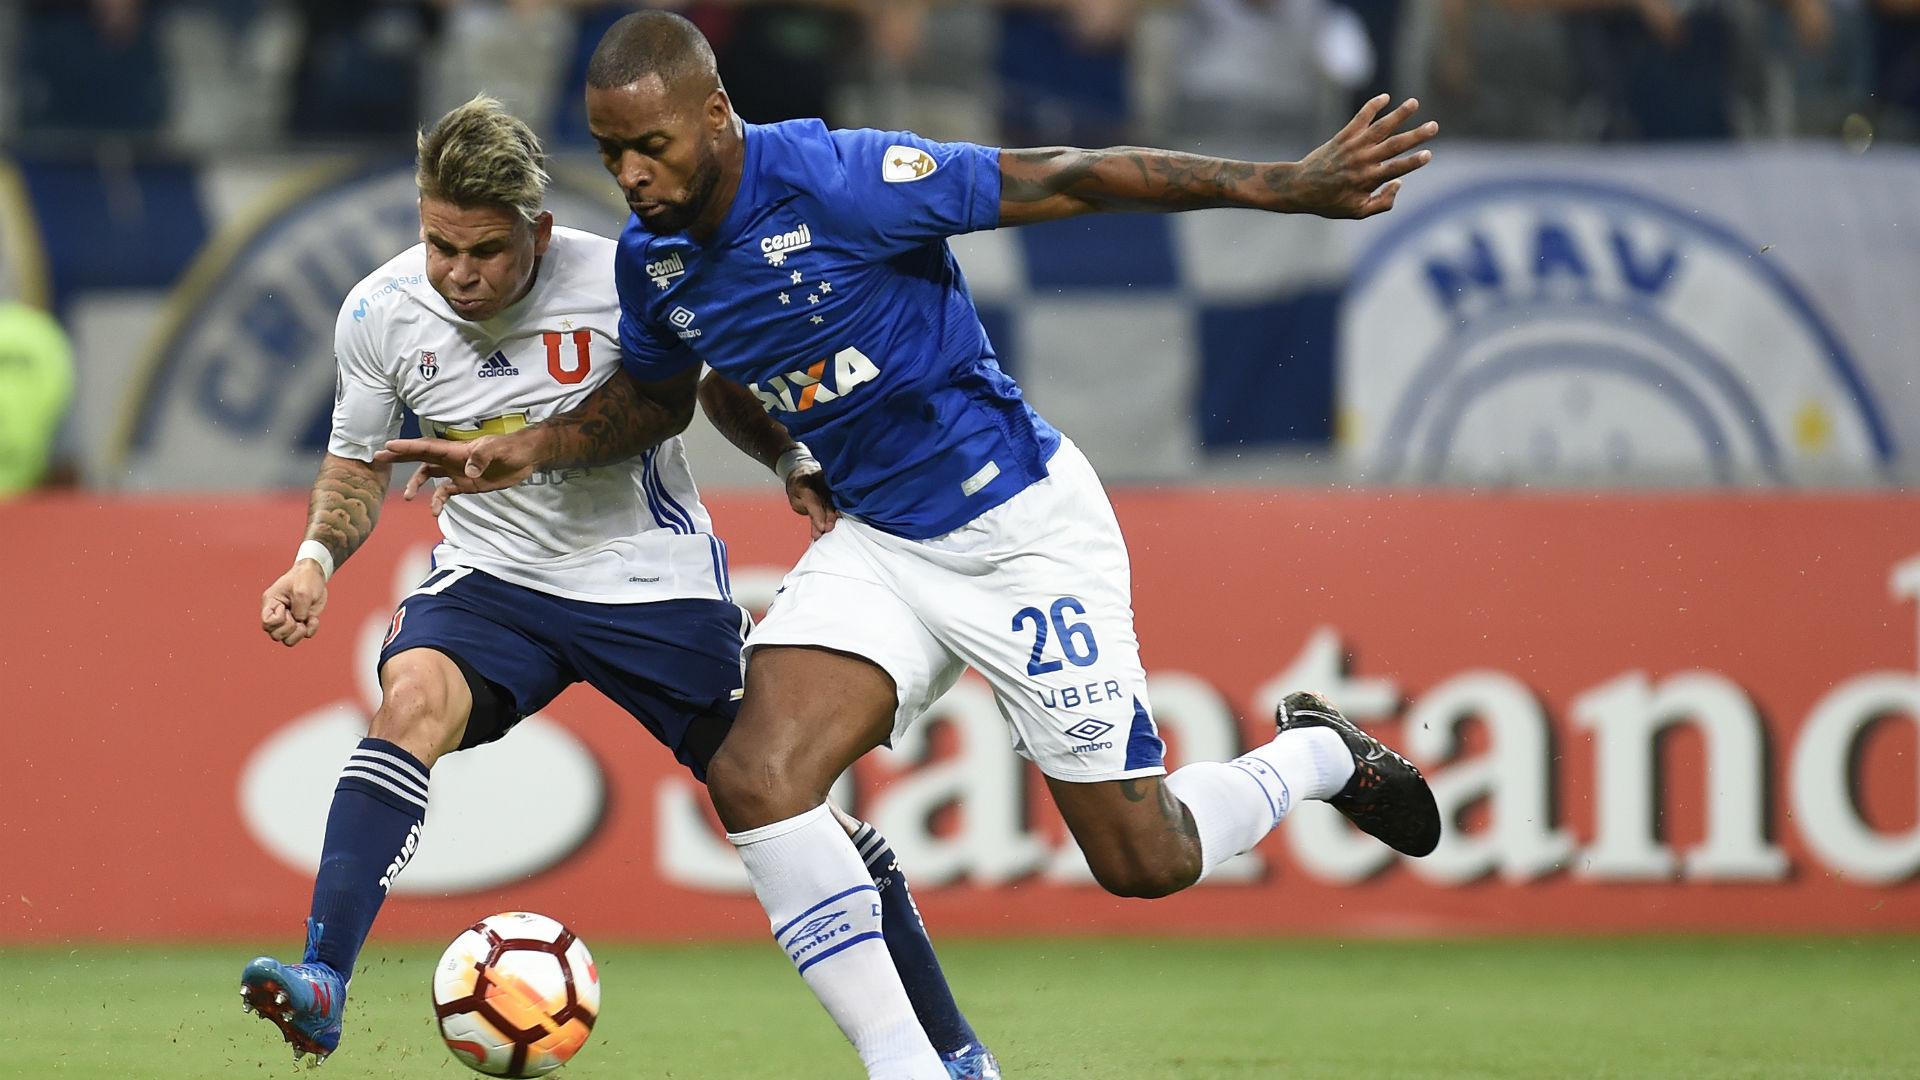 260418 Dedé - Yeferson Soteldo - Cruzeiro vs Universidad de Chile